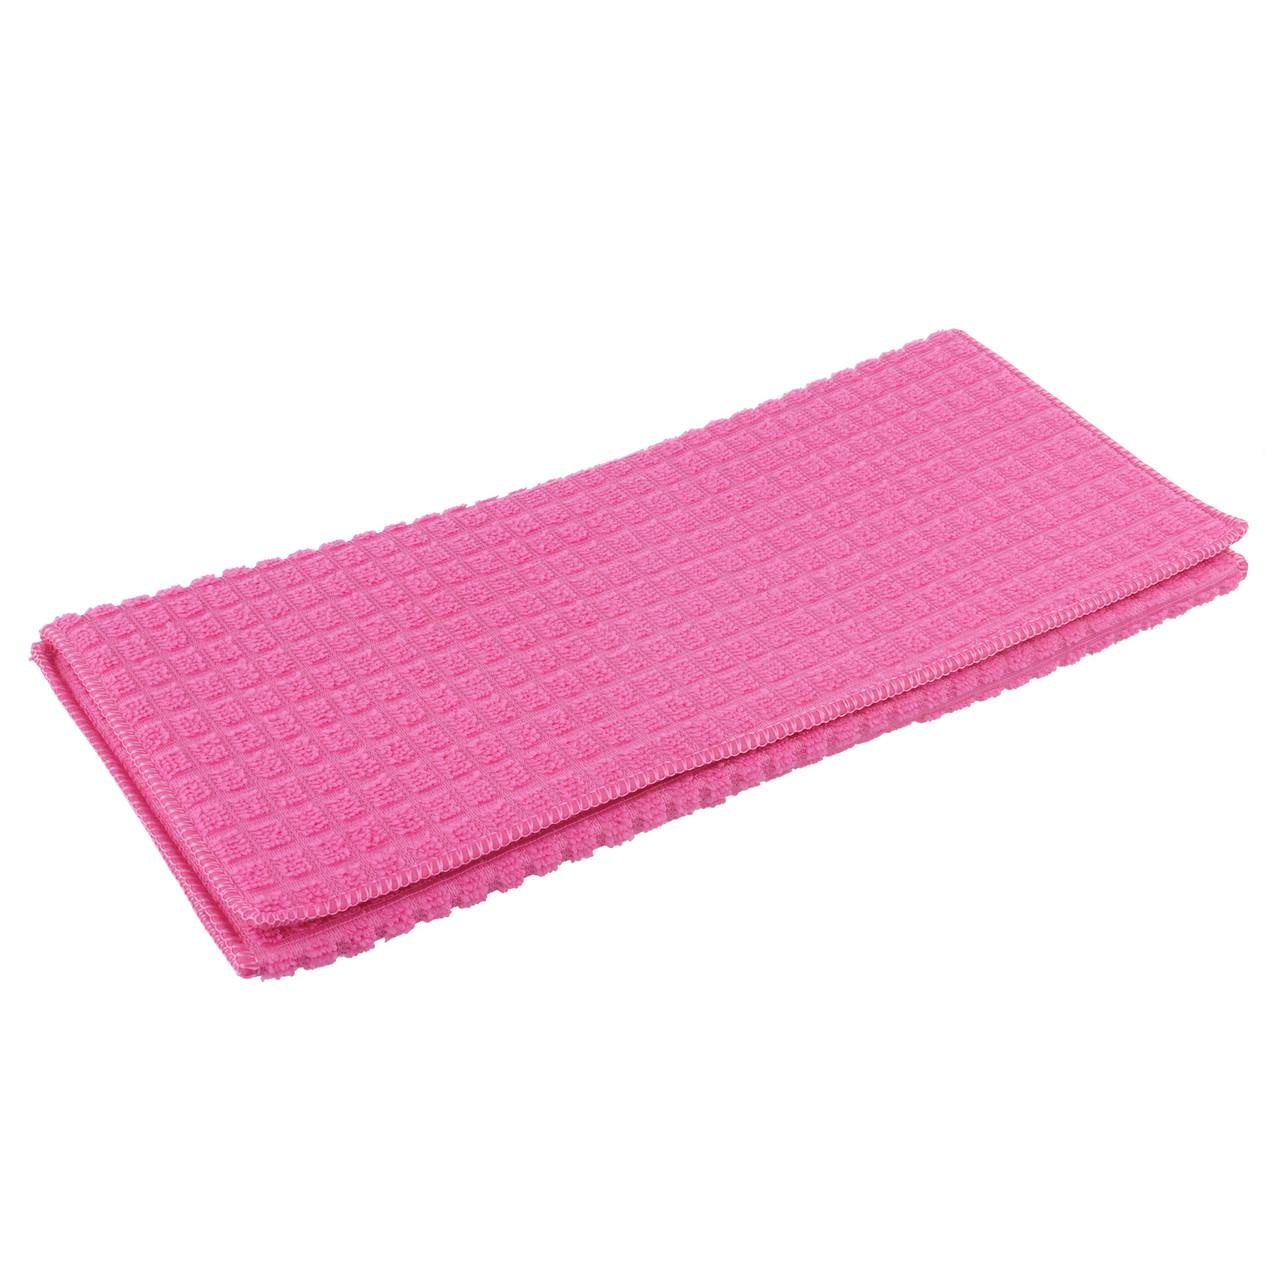 Коврик для сушки посуды 38Х51 см розовый